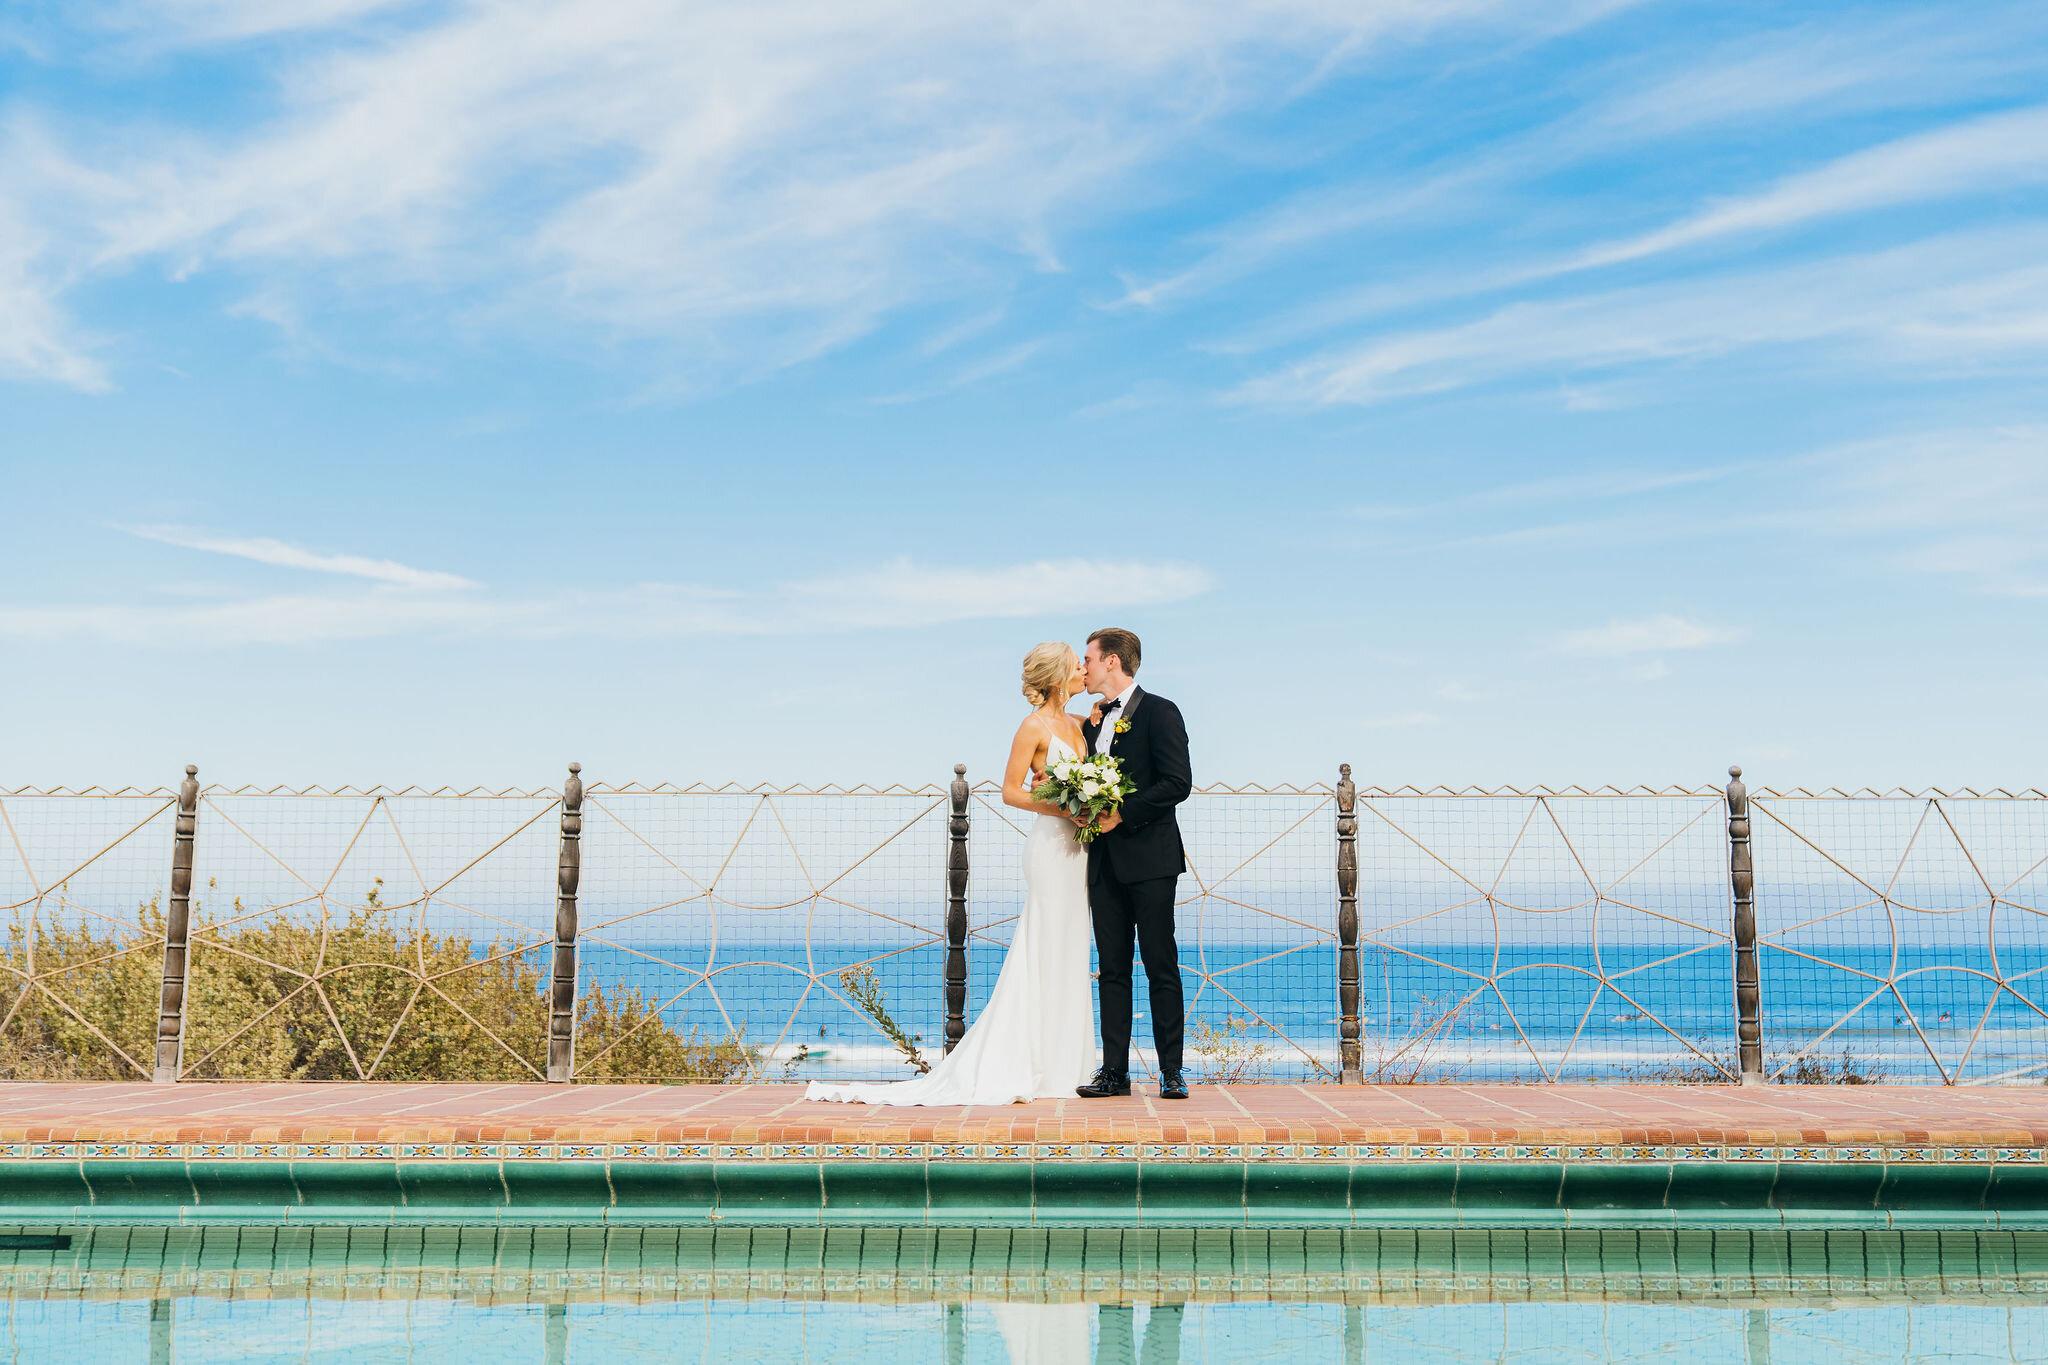 adamson-house-wedding-photography-133.jpg